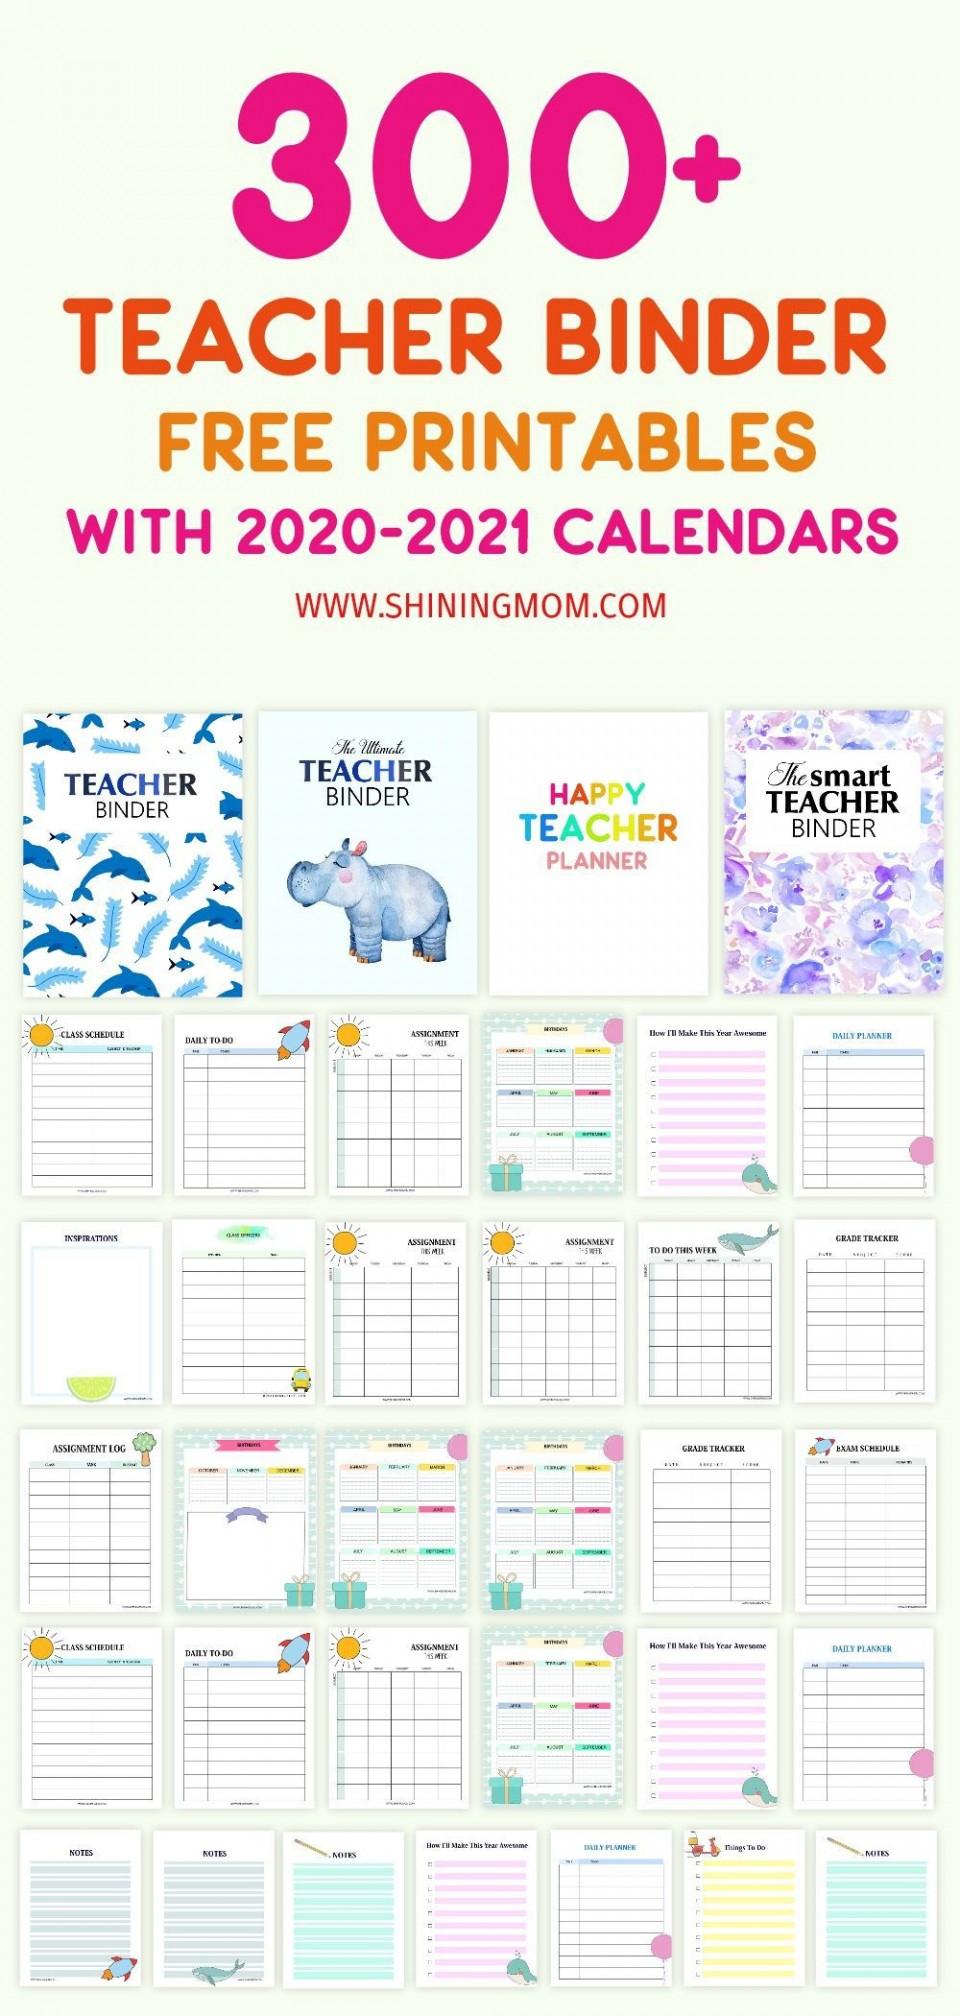 000 Sensational Free Printable Teacher Binder Template High Def 960